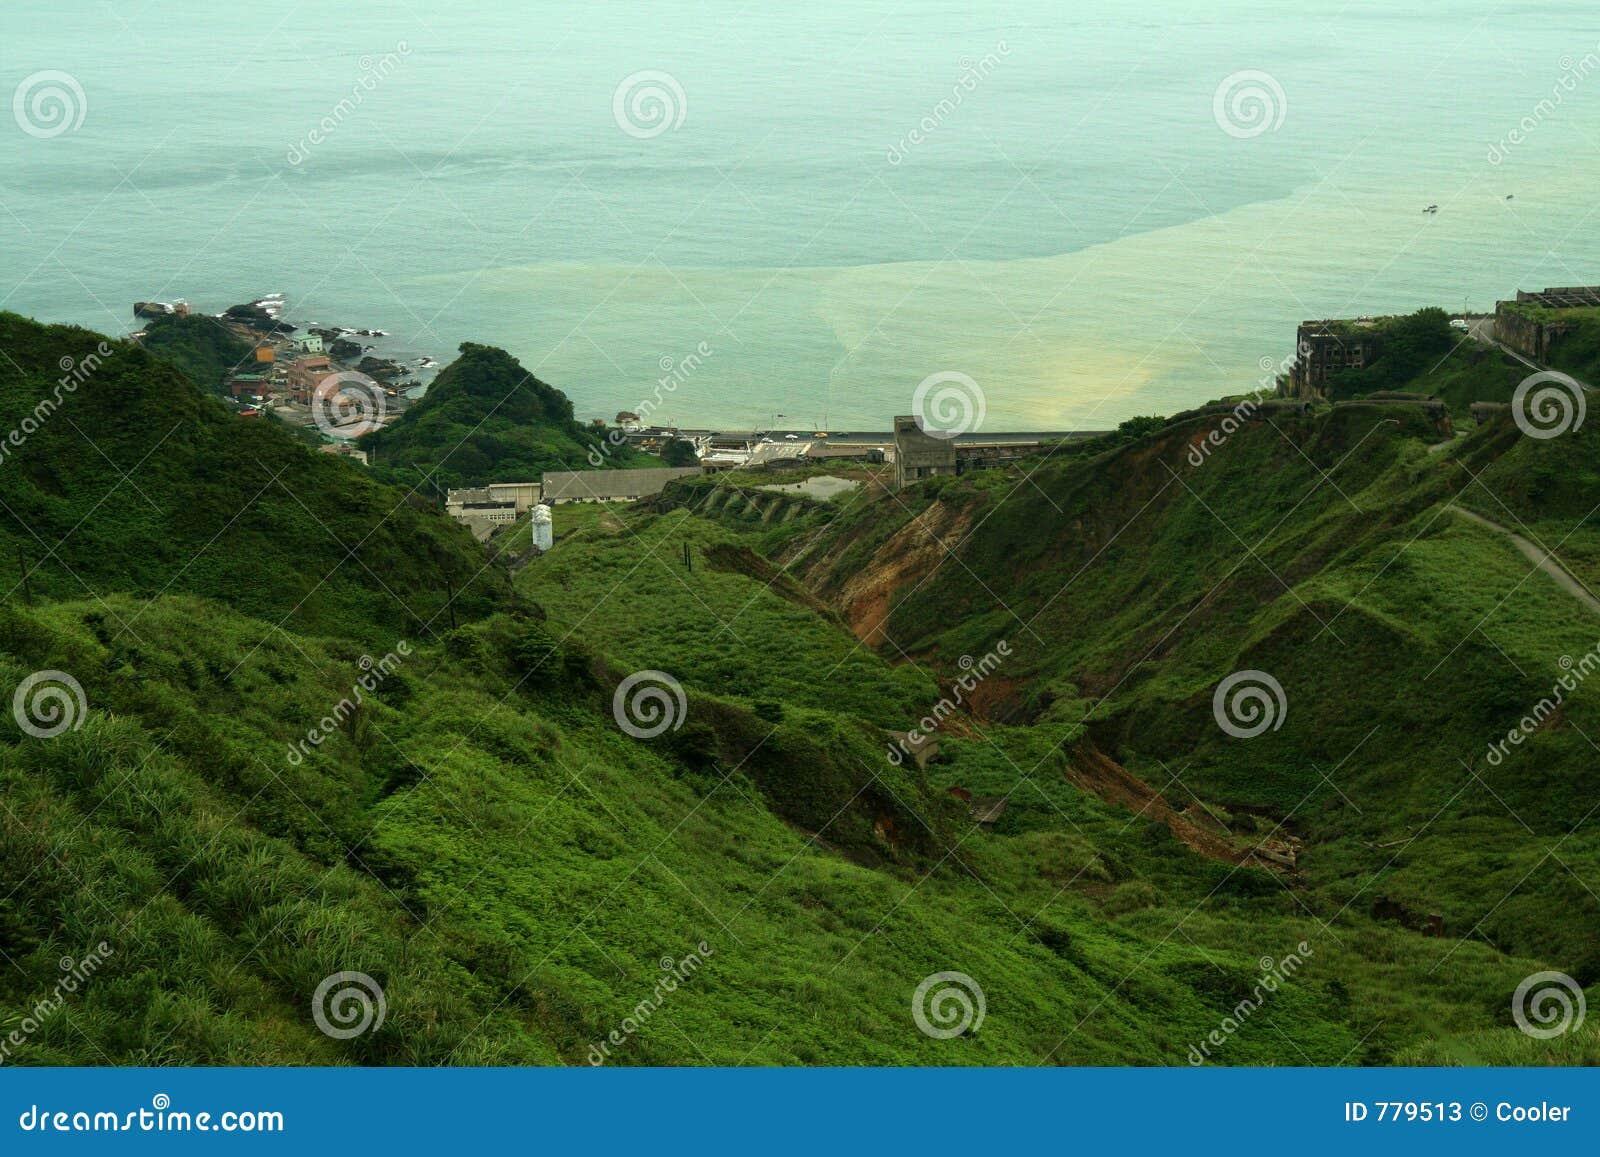 Mountainous landscape Taiwan